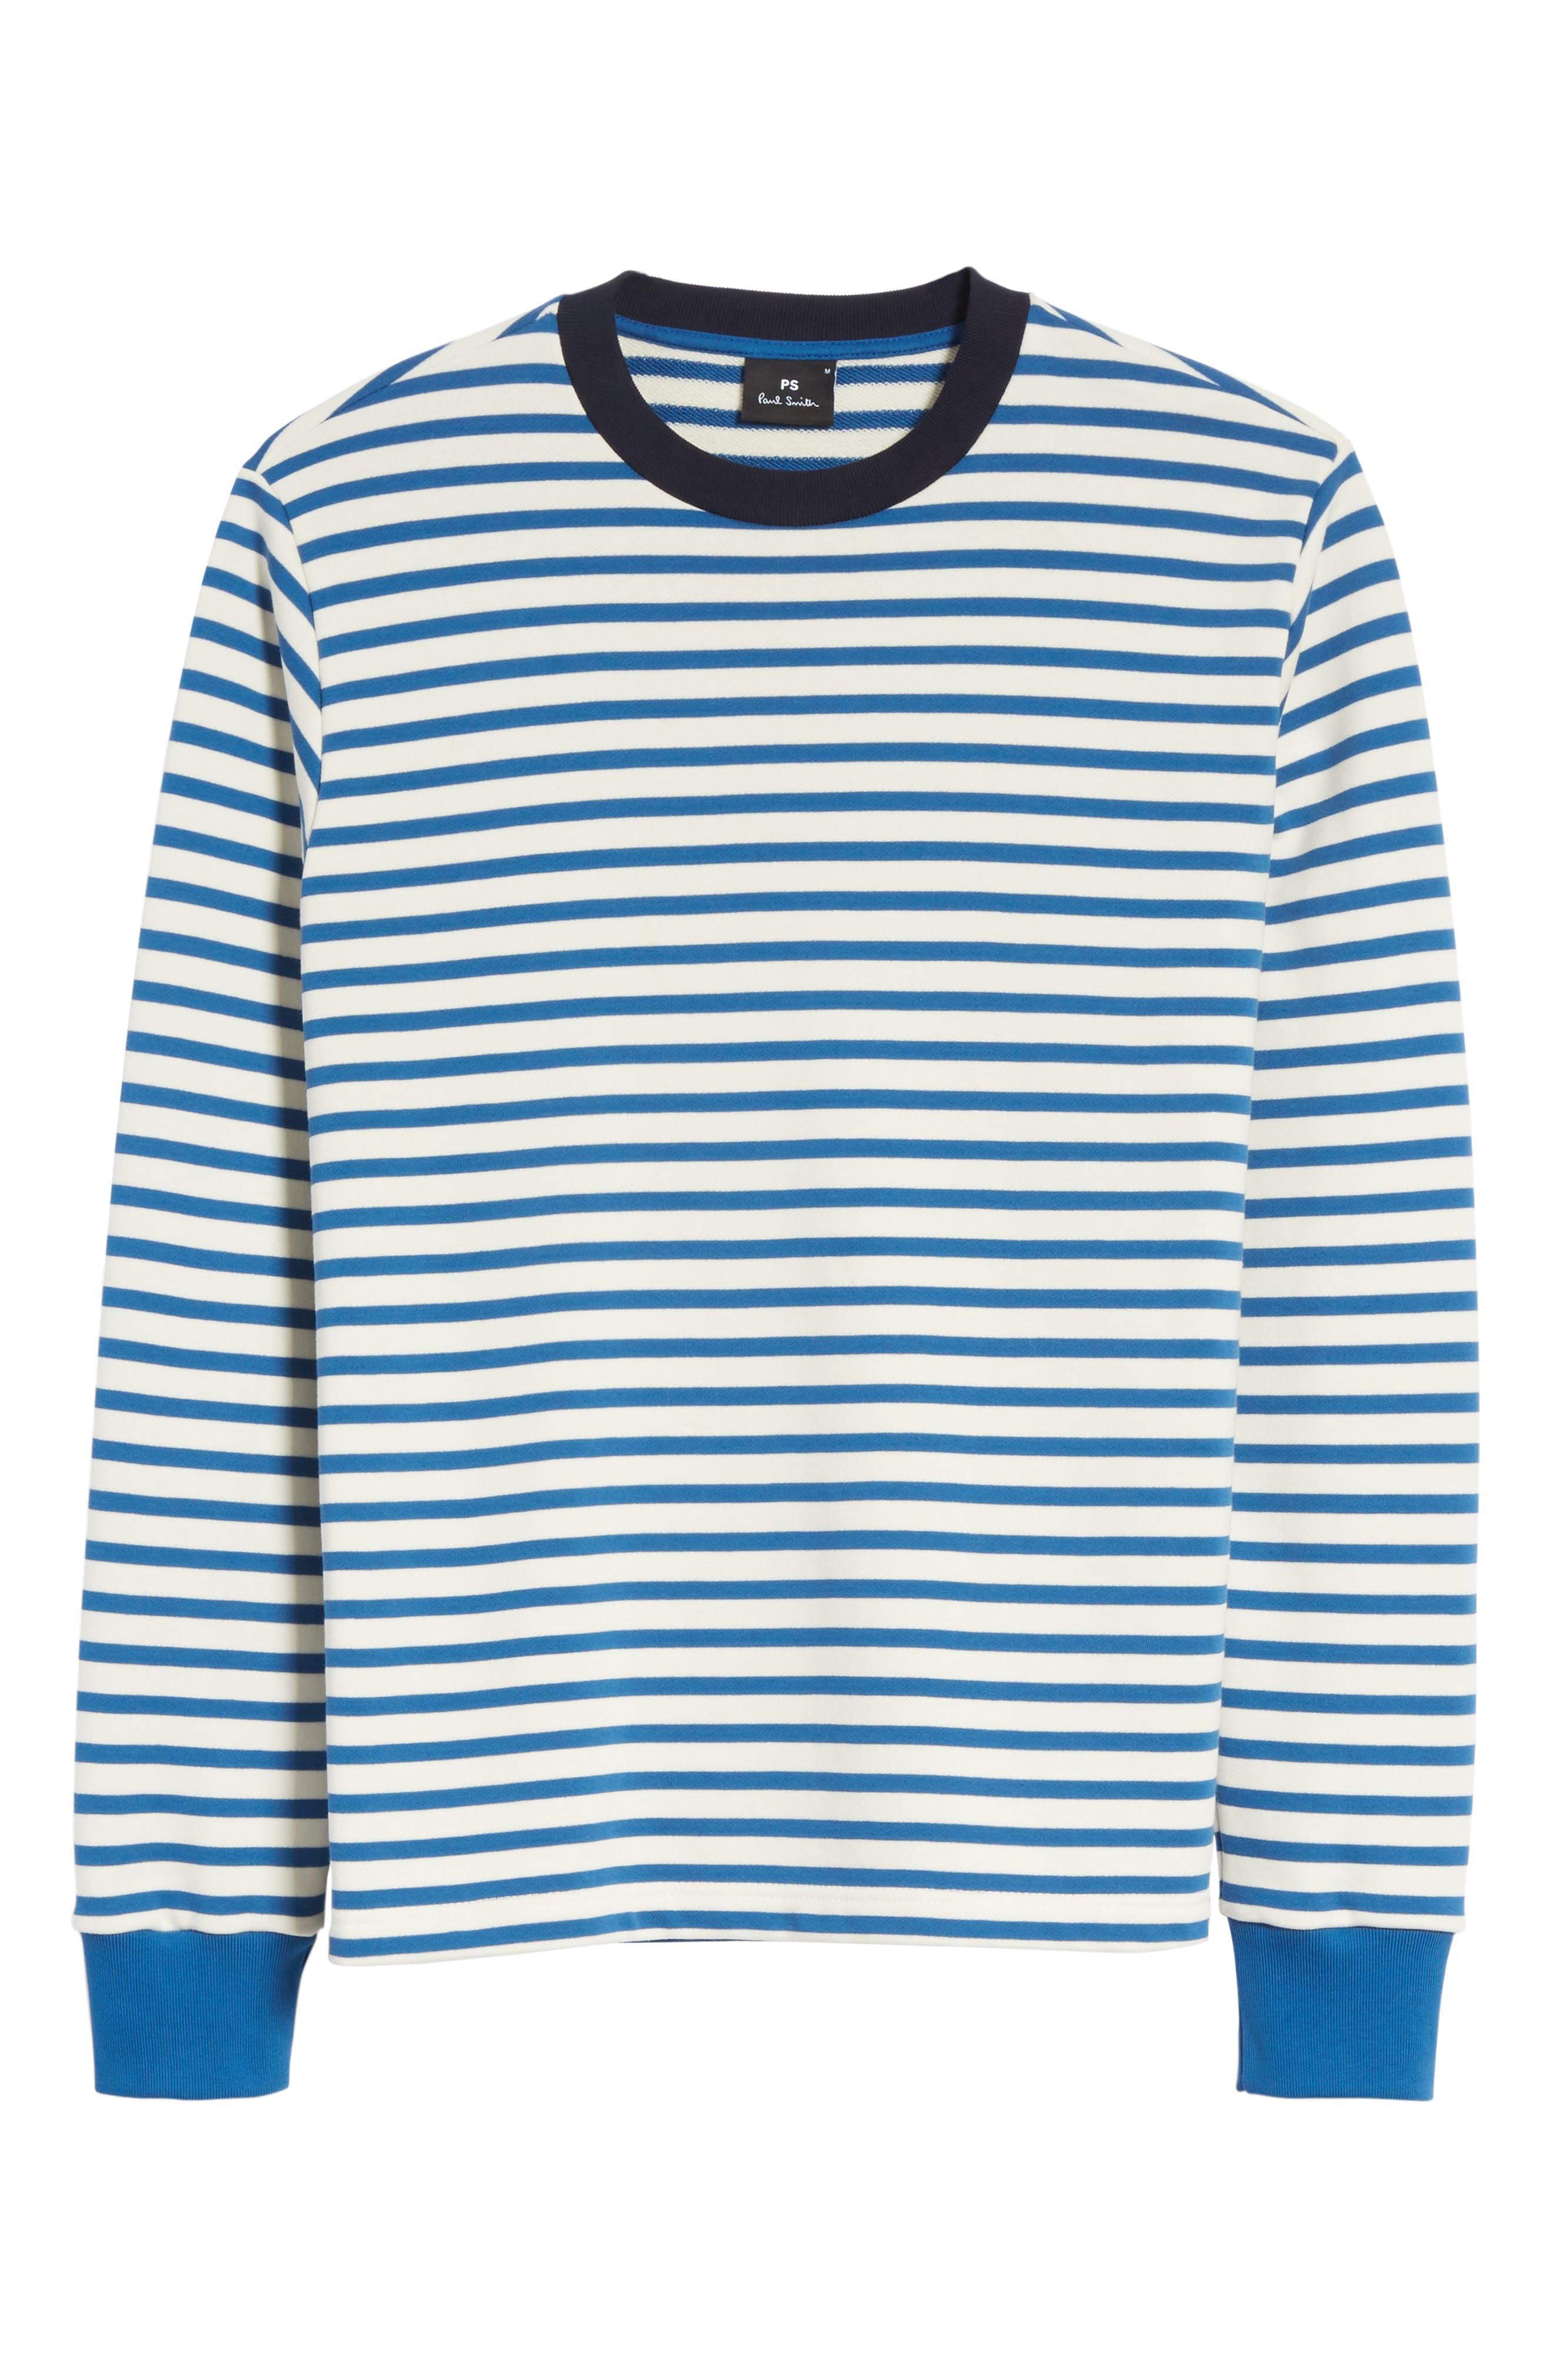 Stripe Crewneck Sweatshirt,                             Alternate thumbnail 6, color,                             434